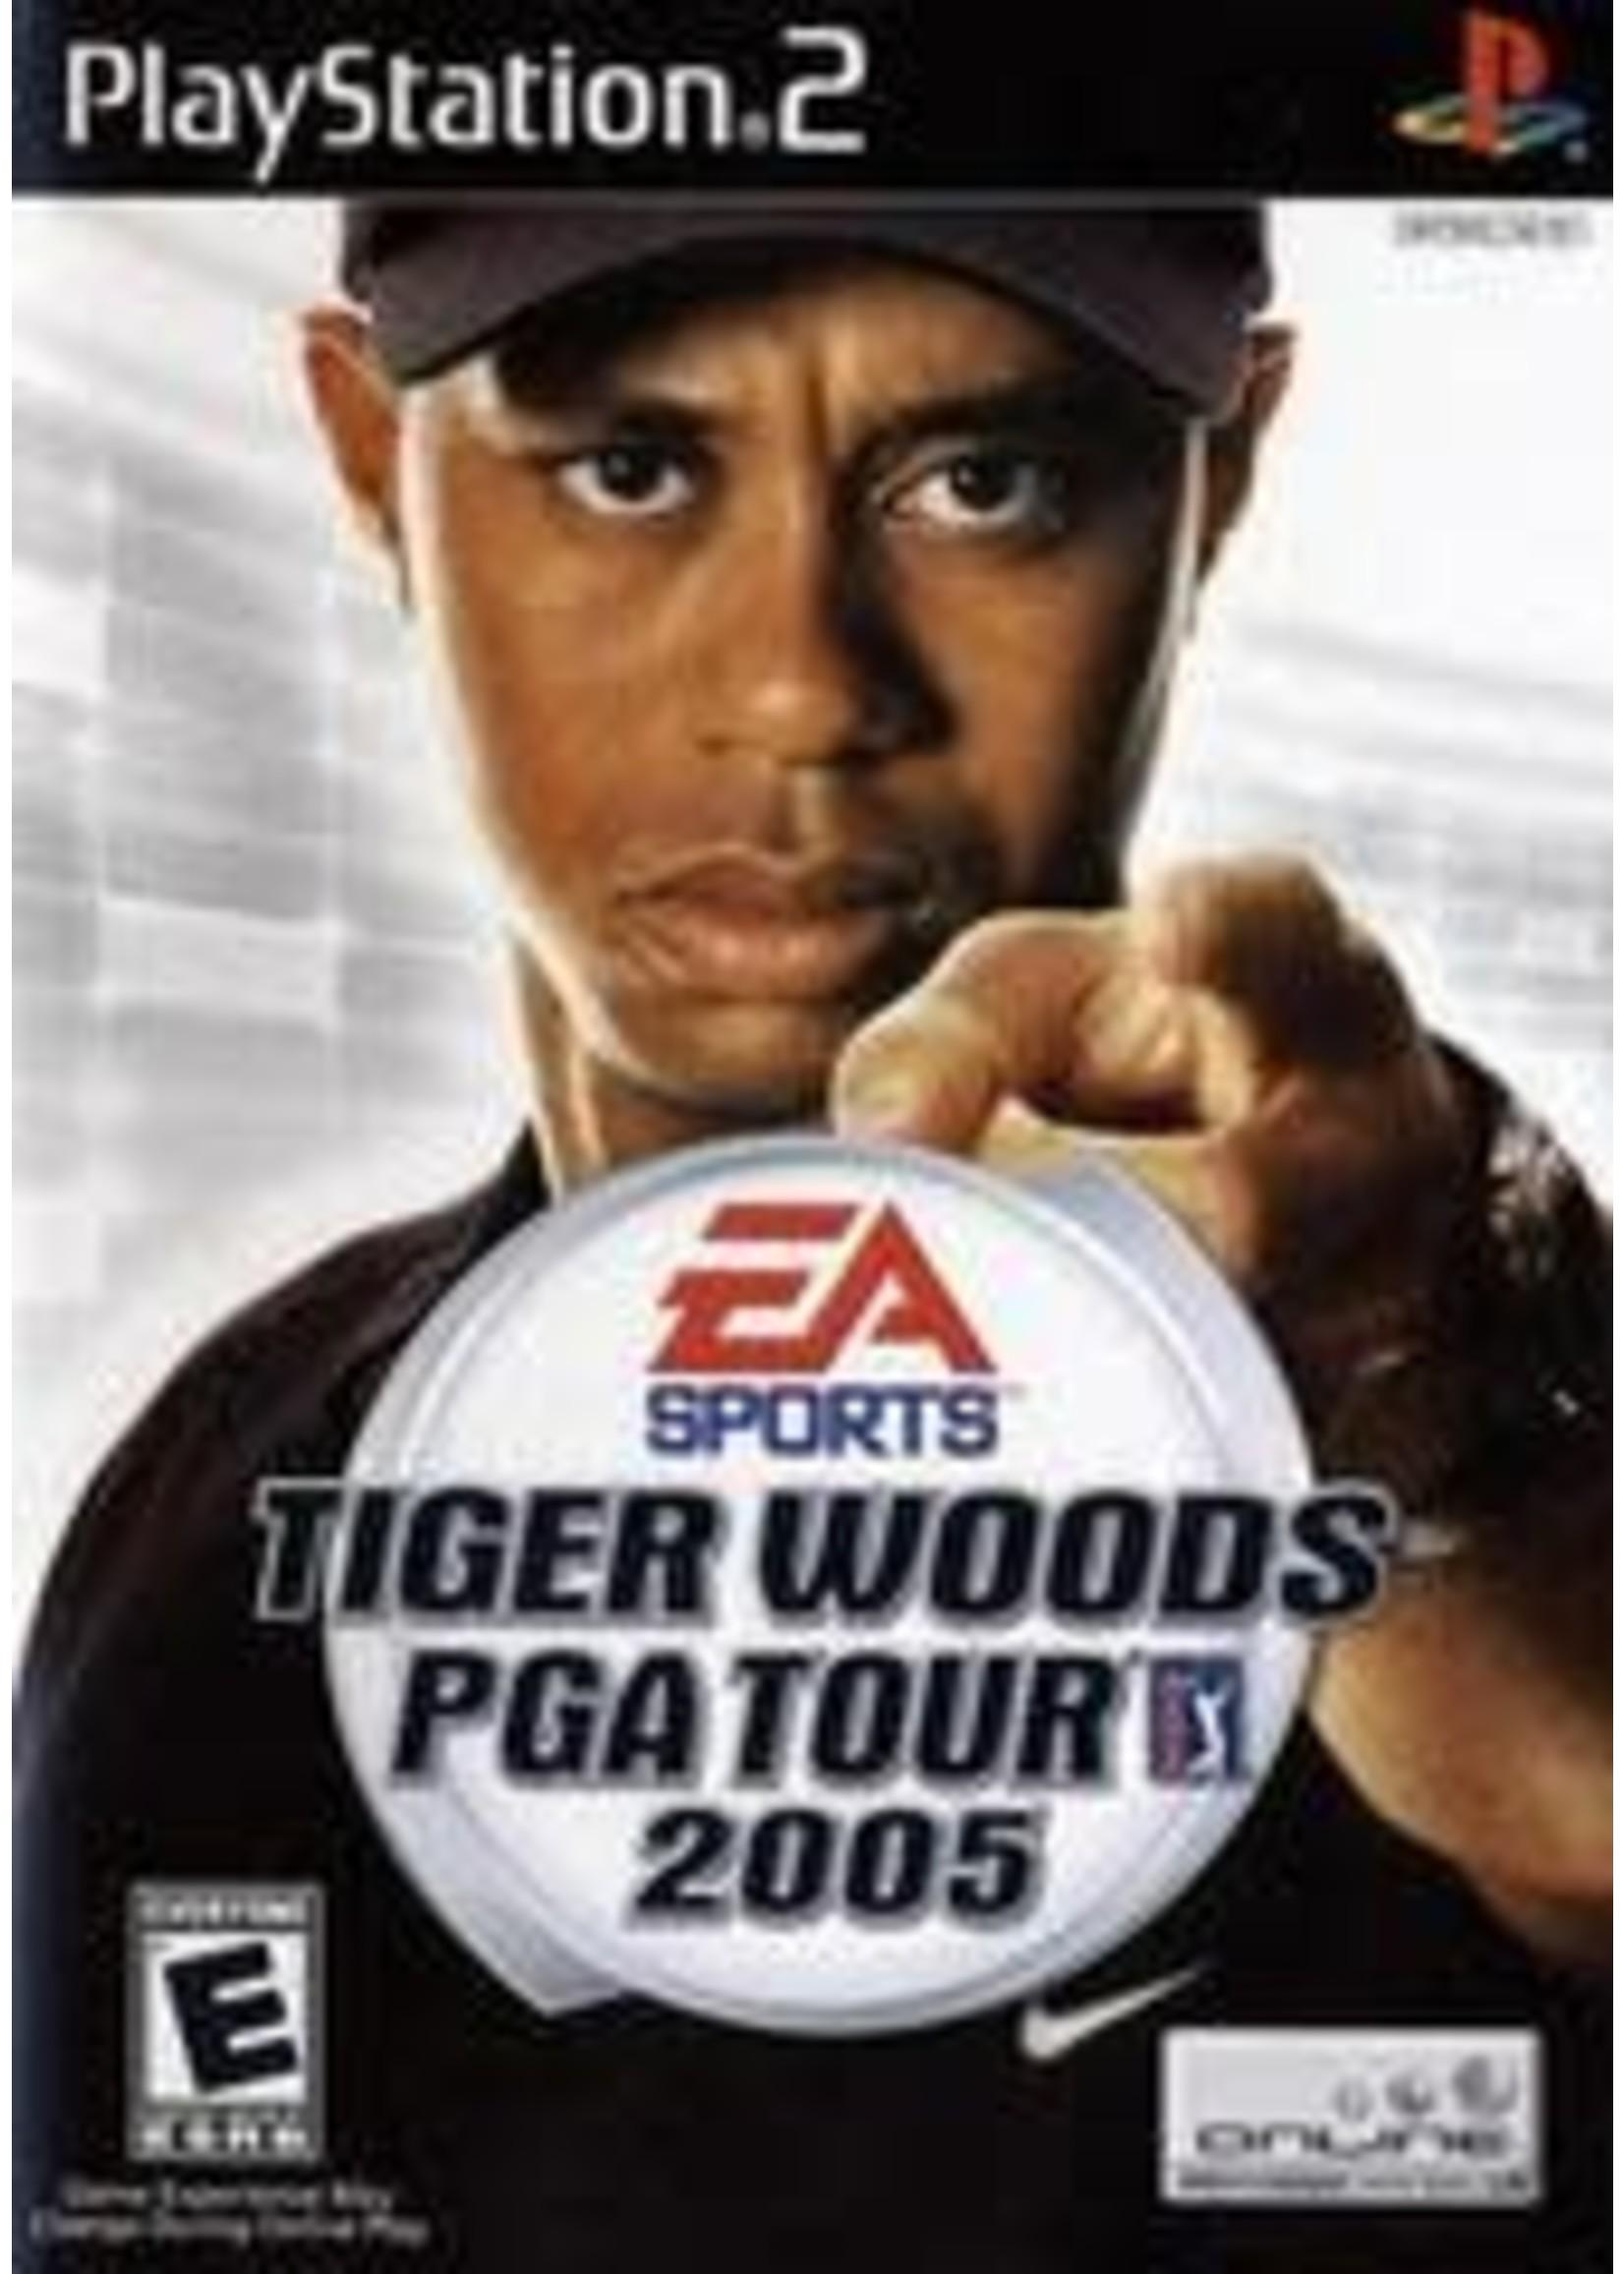 Tiger Woods 2005 Playstation 2